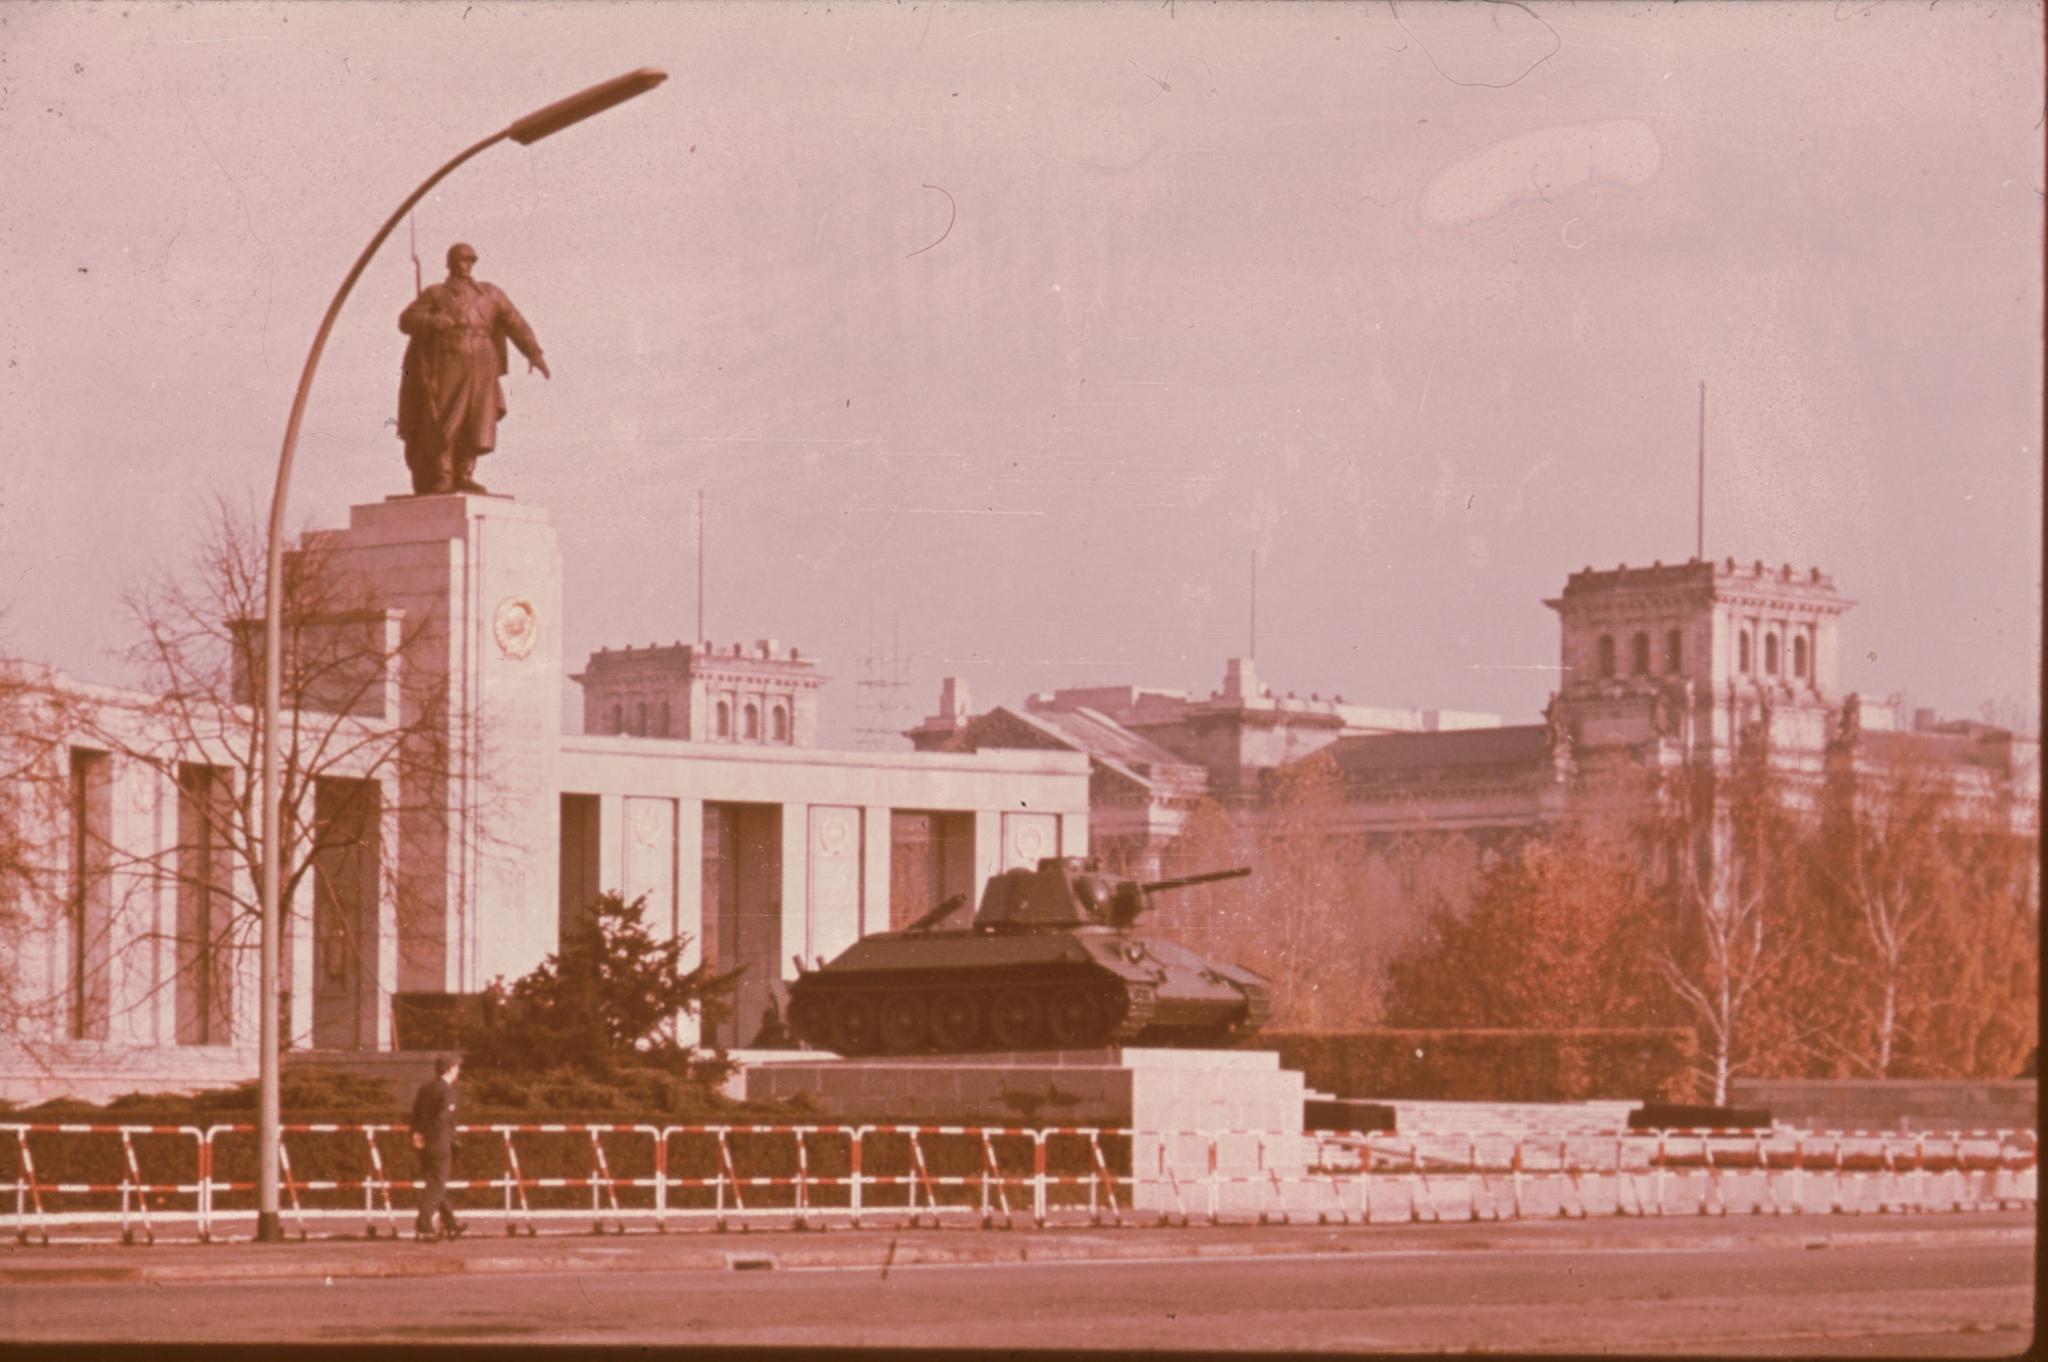 Die Berliner Mauer um 1973 - Berlin Wall - Daniel Rohde-Kage 47